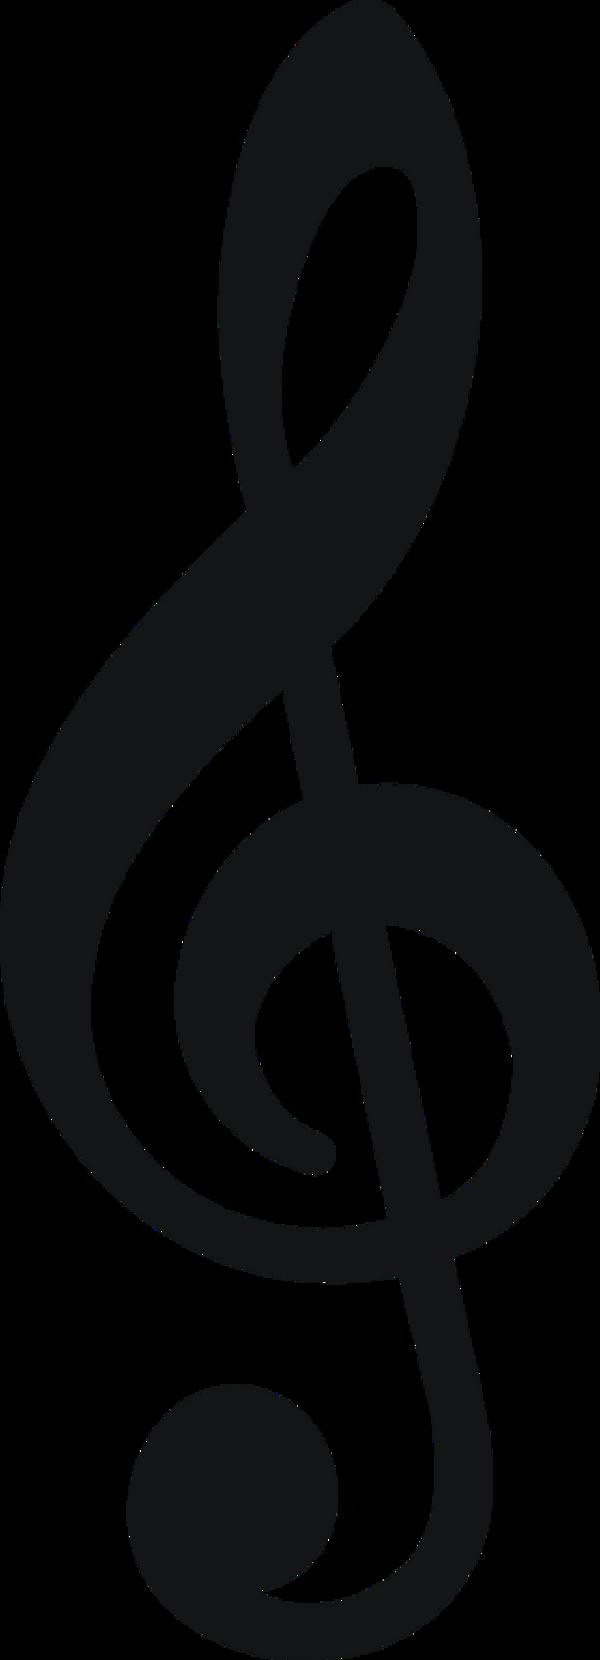 clip art Treble clef clipart. Clefs vector clip art